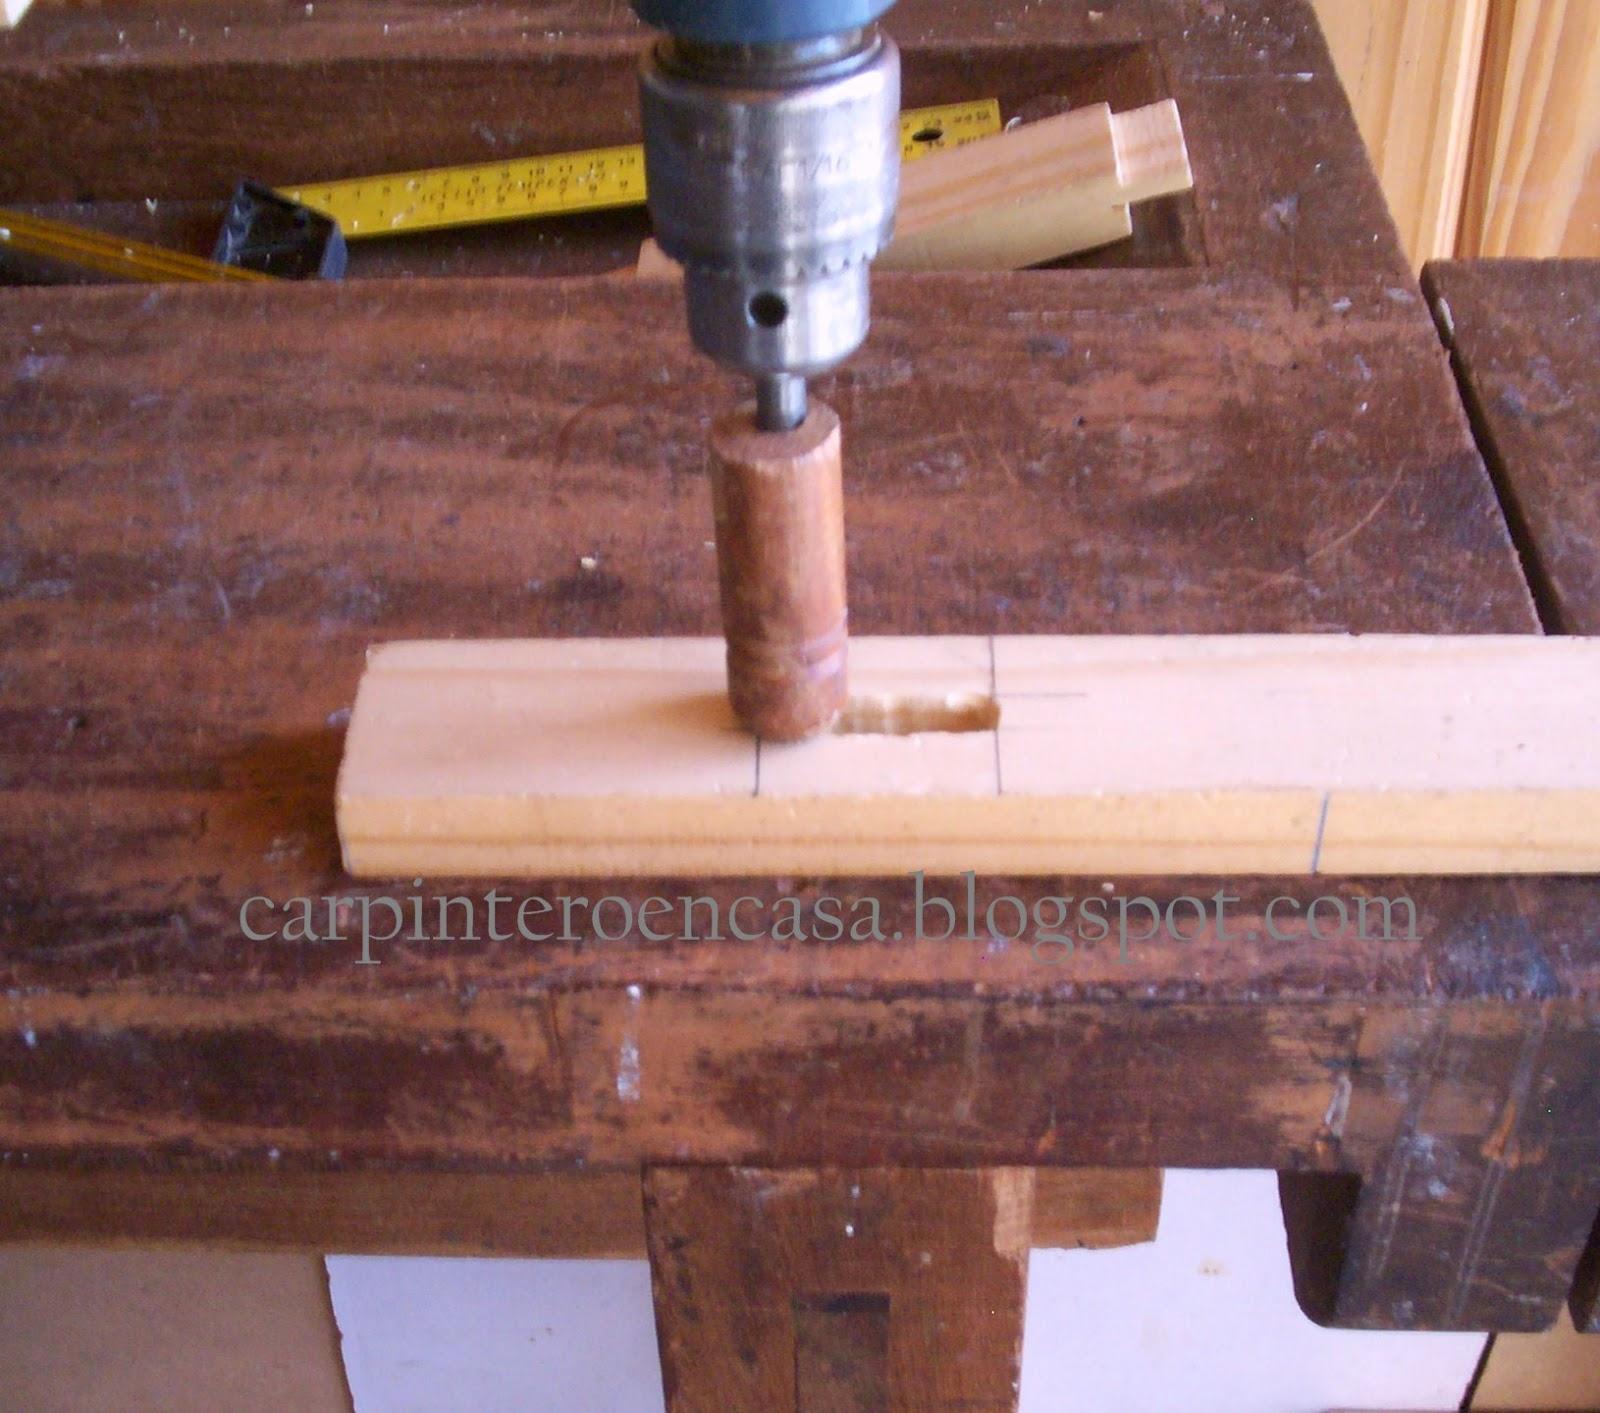 Carpintero en casa caja y espiga 2 - Taladro de la madera ...